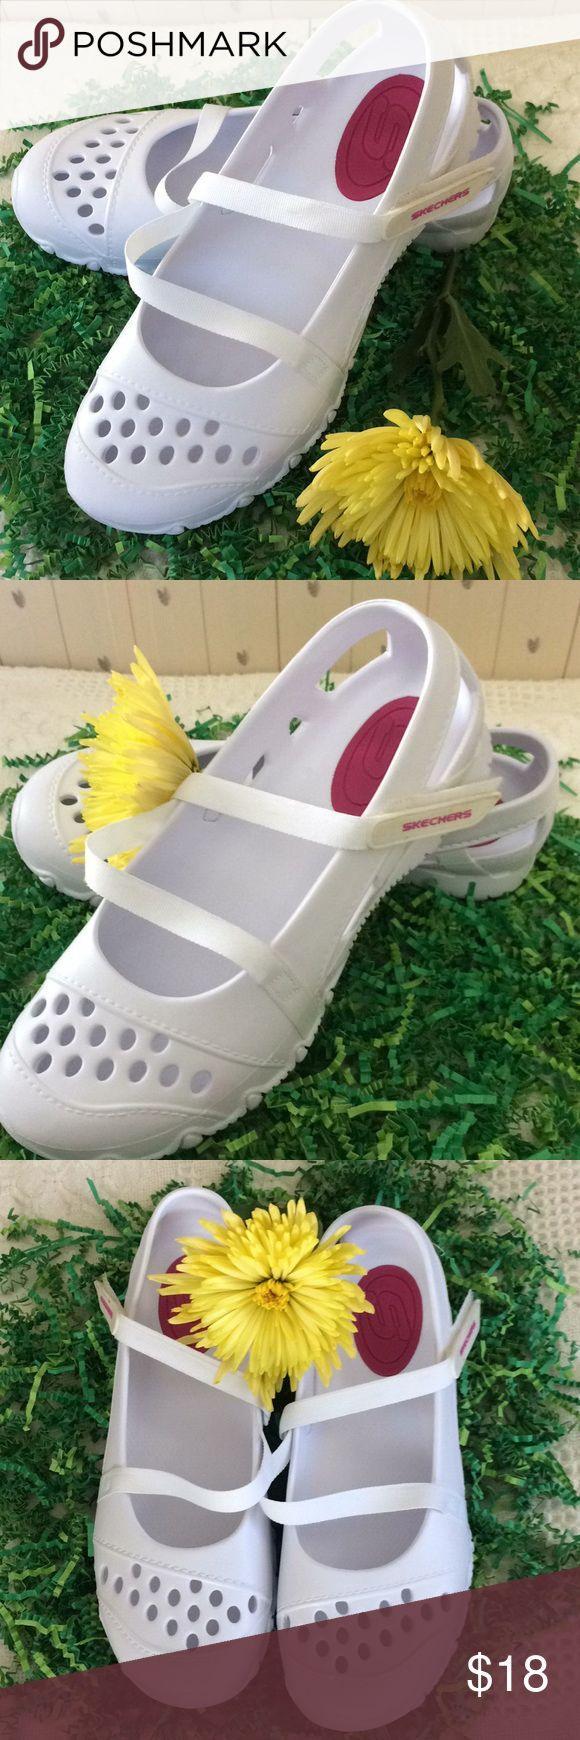 💕SKECHERS💕Women Footwear Saint Patrick Sale!!!! New without box. Perfect condition! Skechers Shoes Platforms